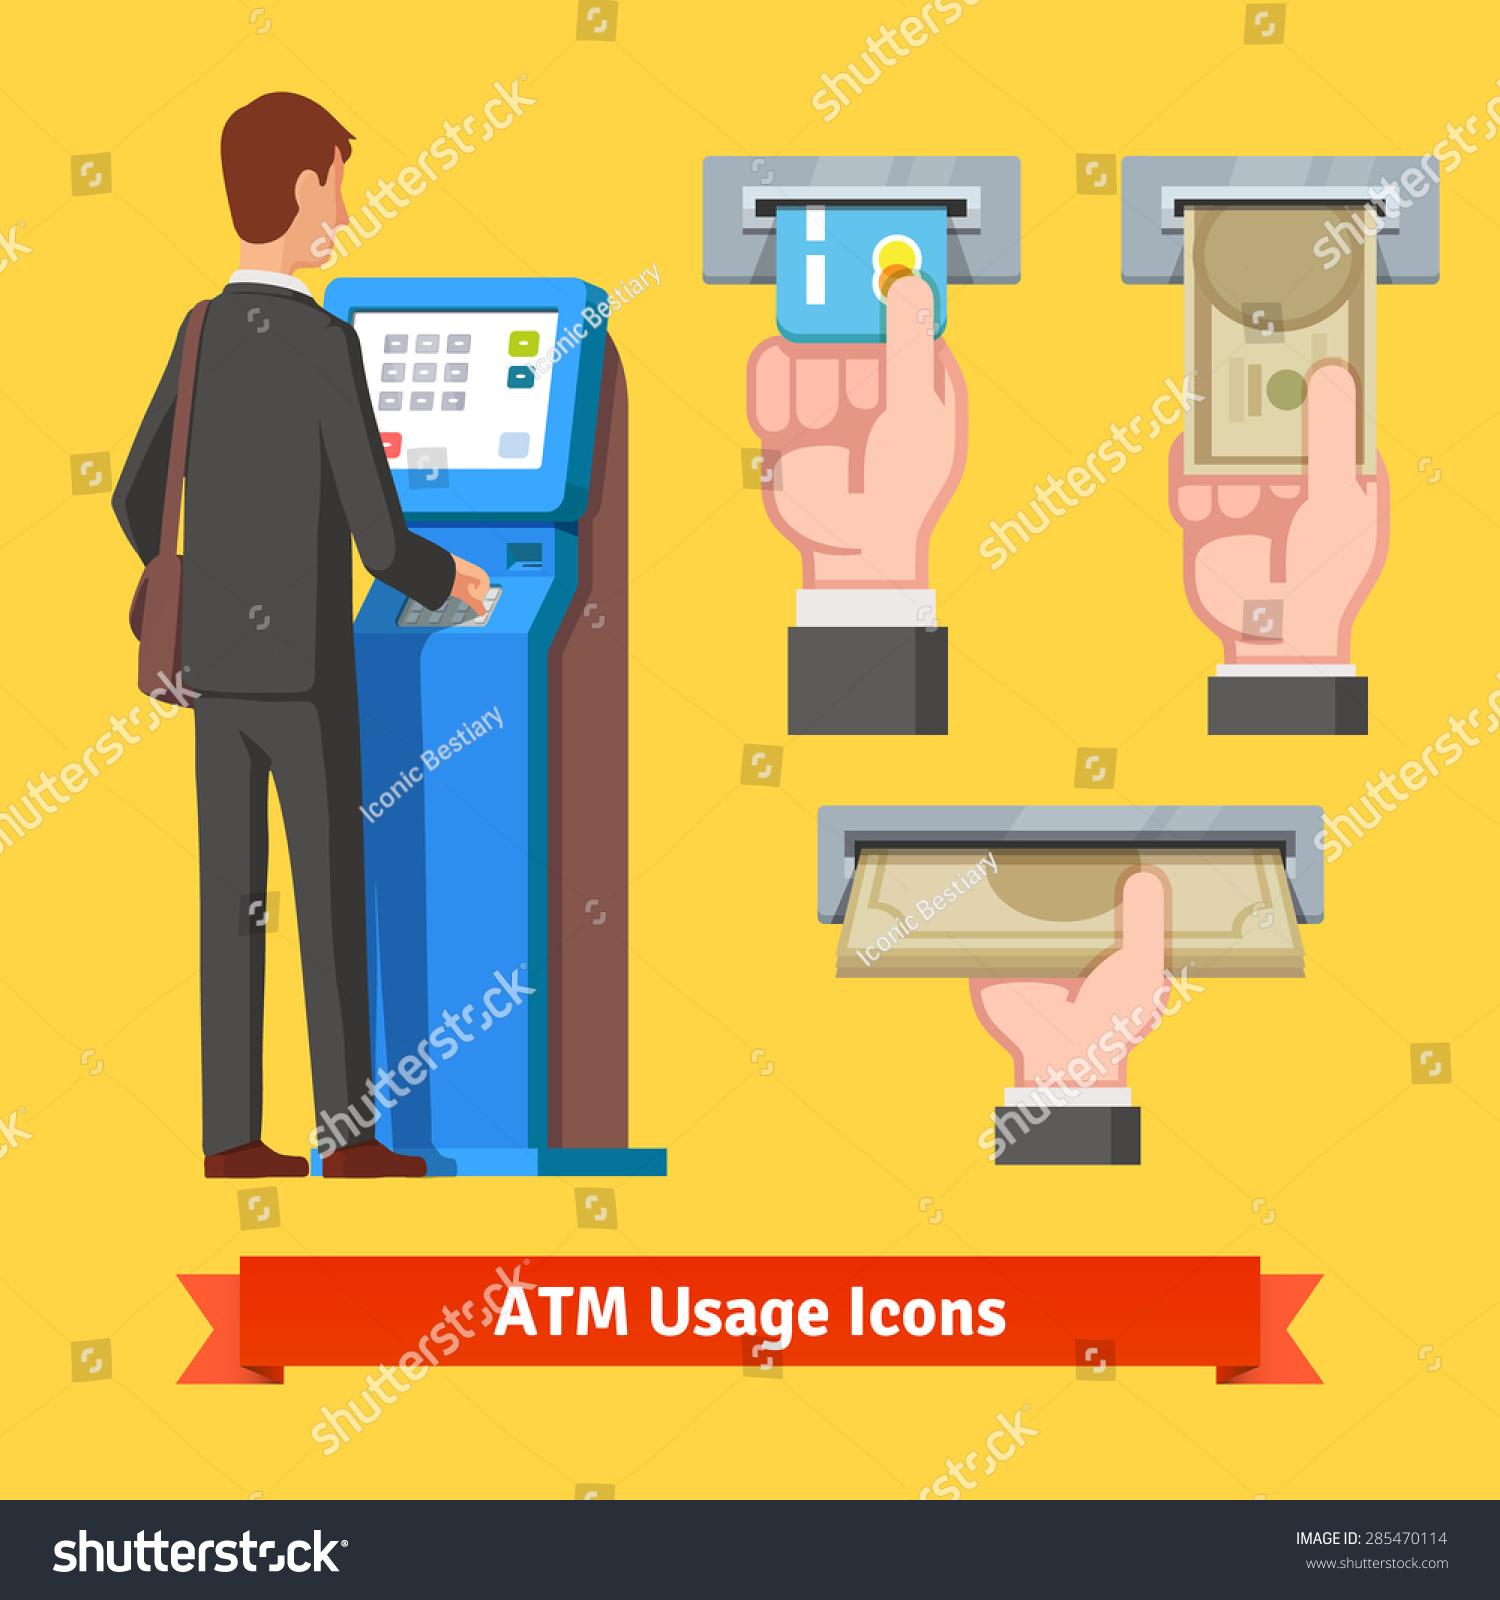 Technology Management Image: Businessman Using Modern Atm Machine. Money Deposit And